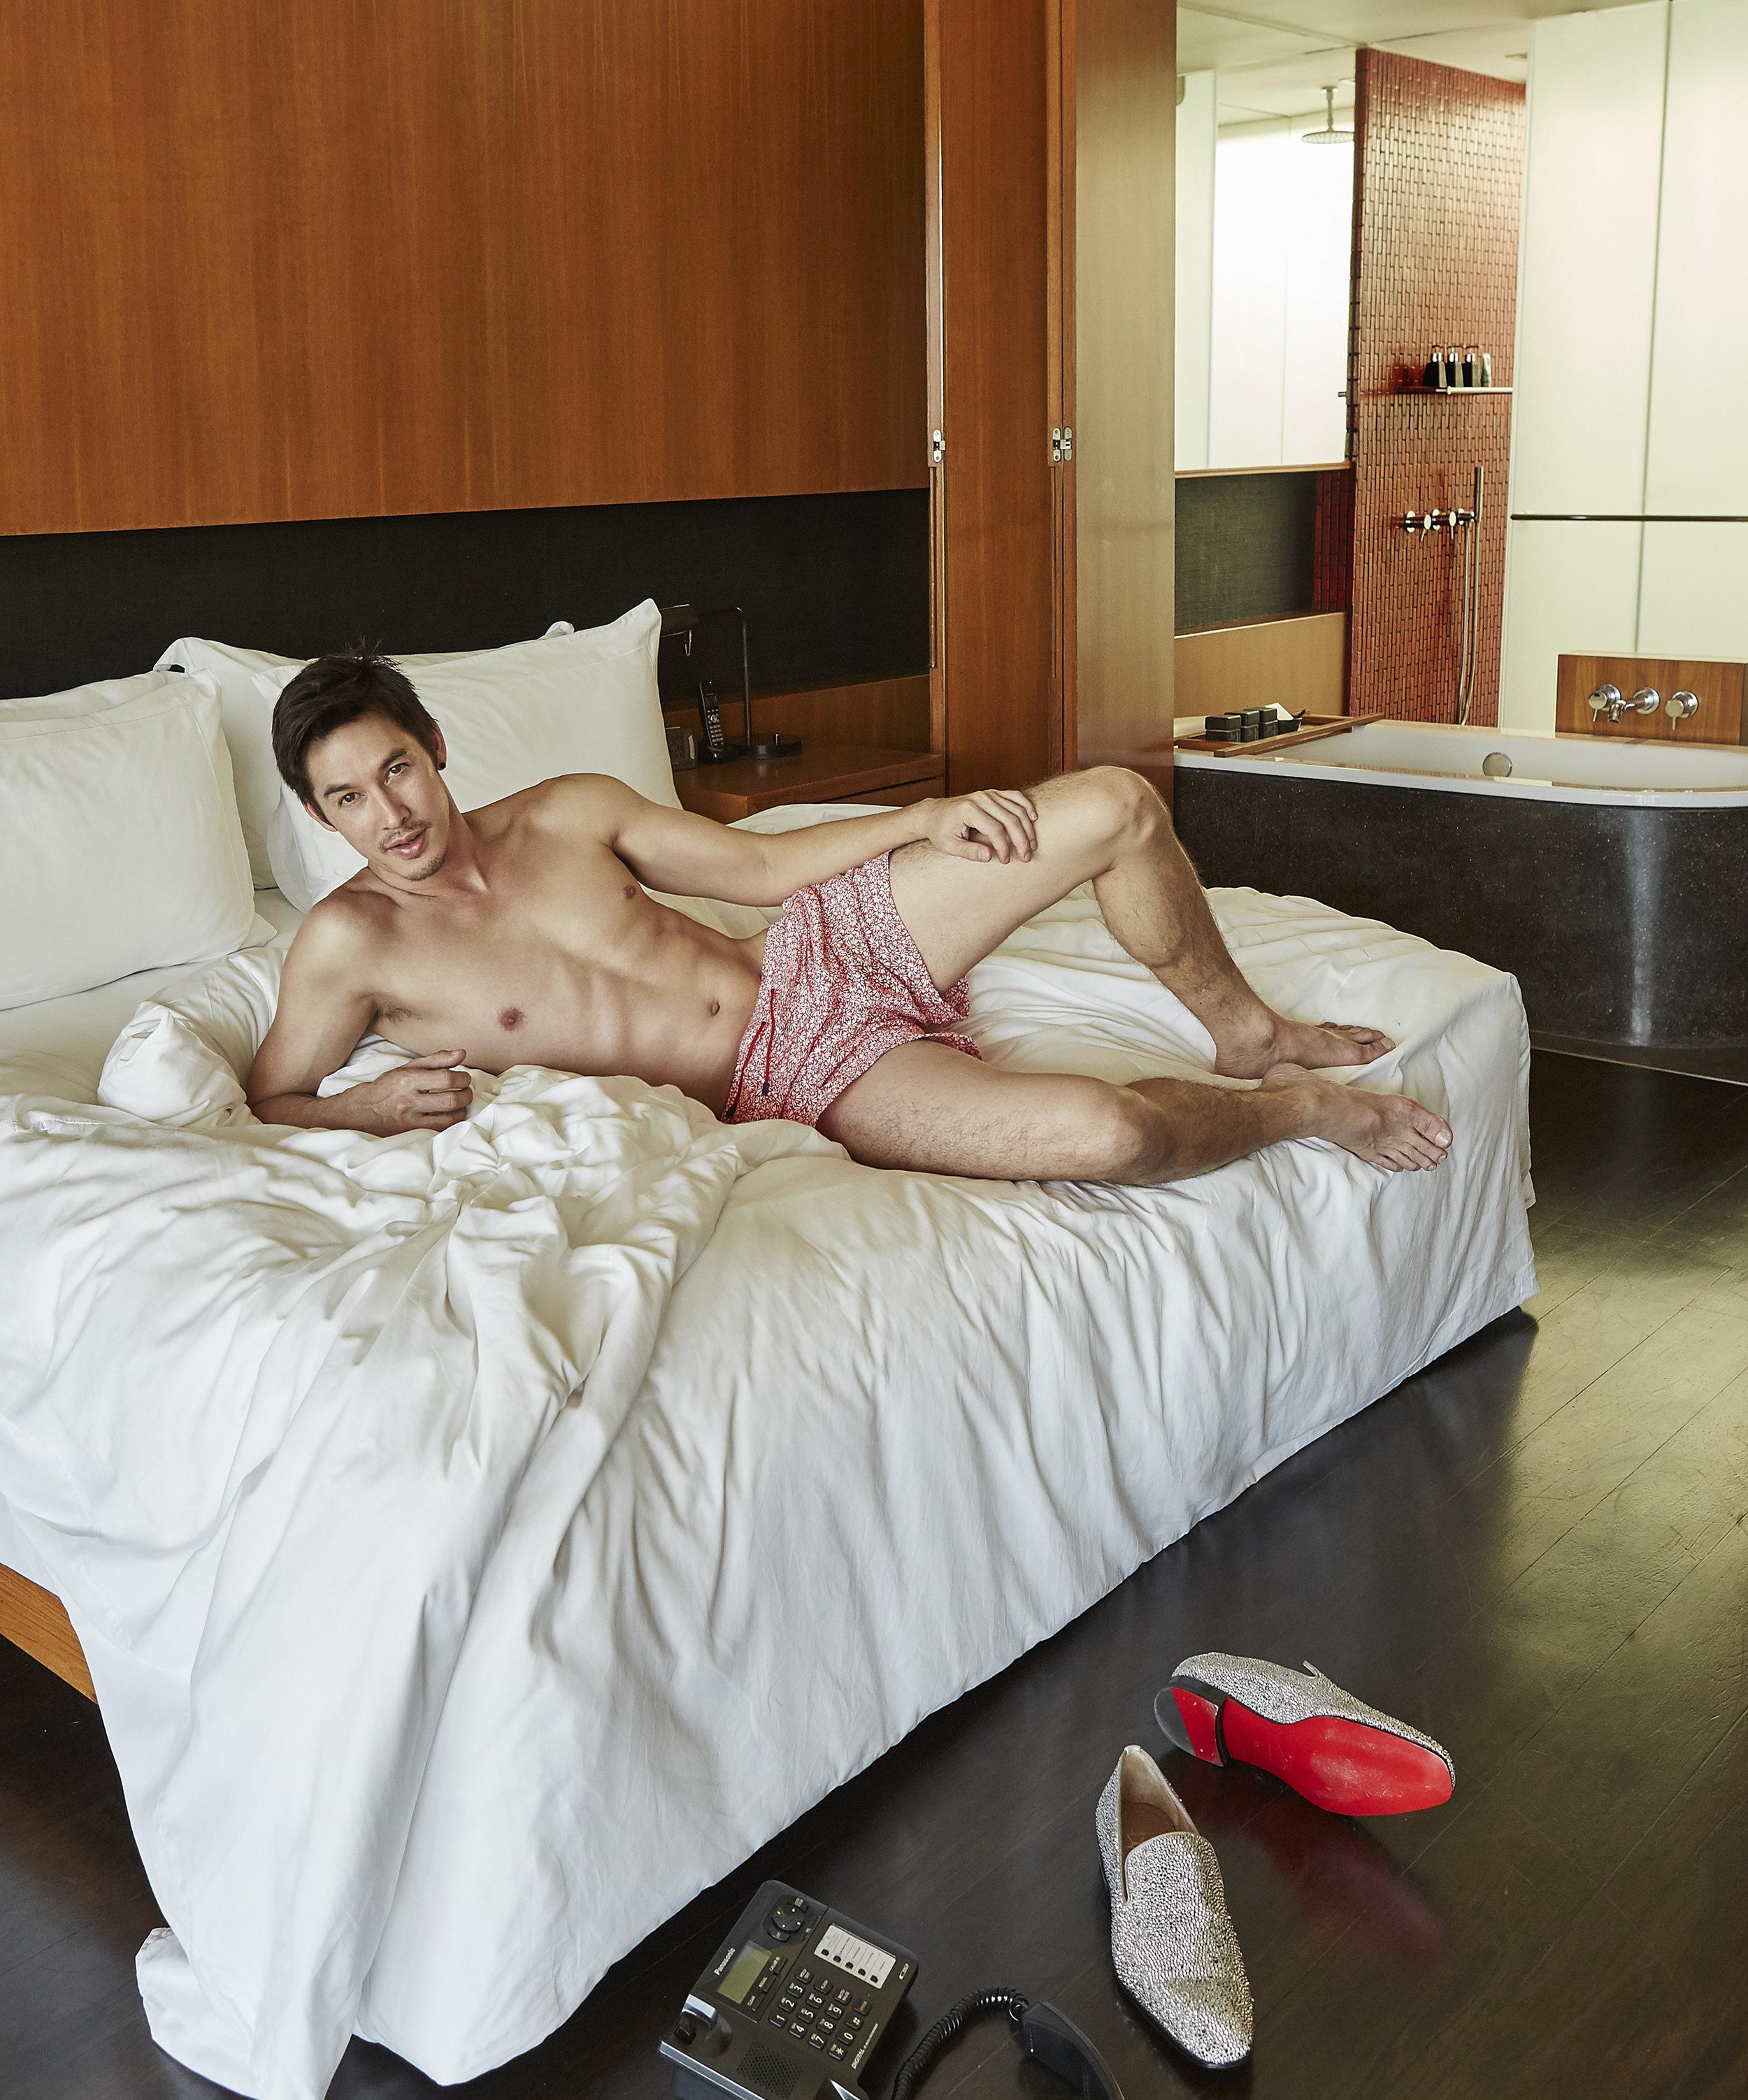 shorts : Hackett London / shoes : Christian Louboutin